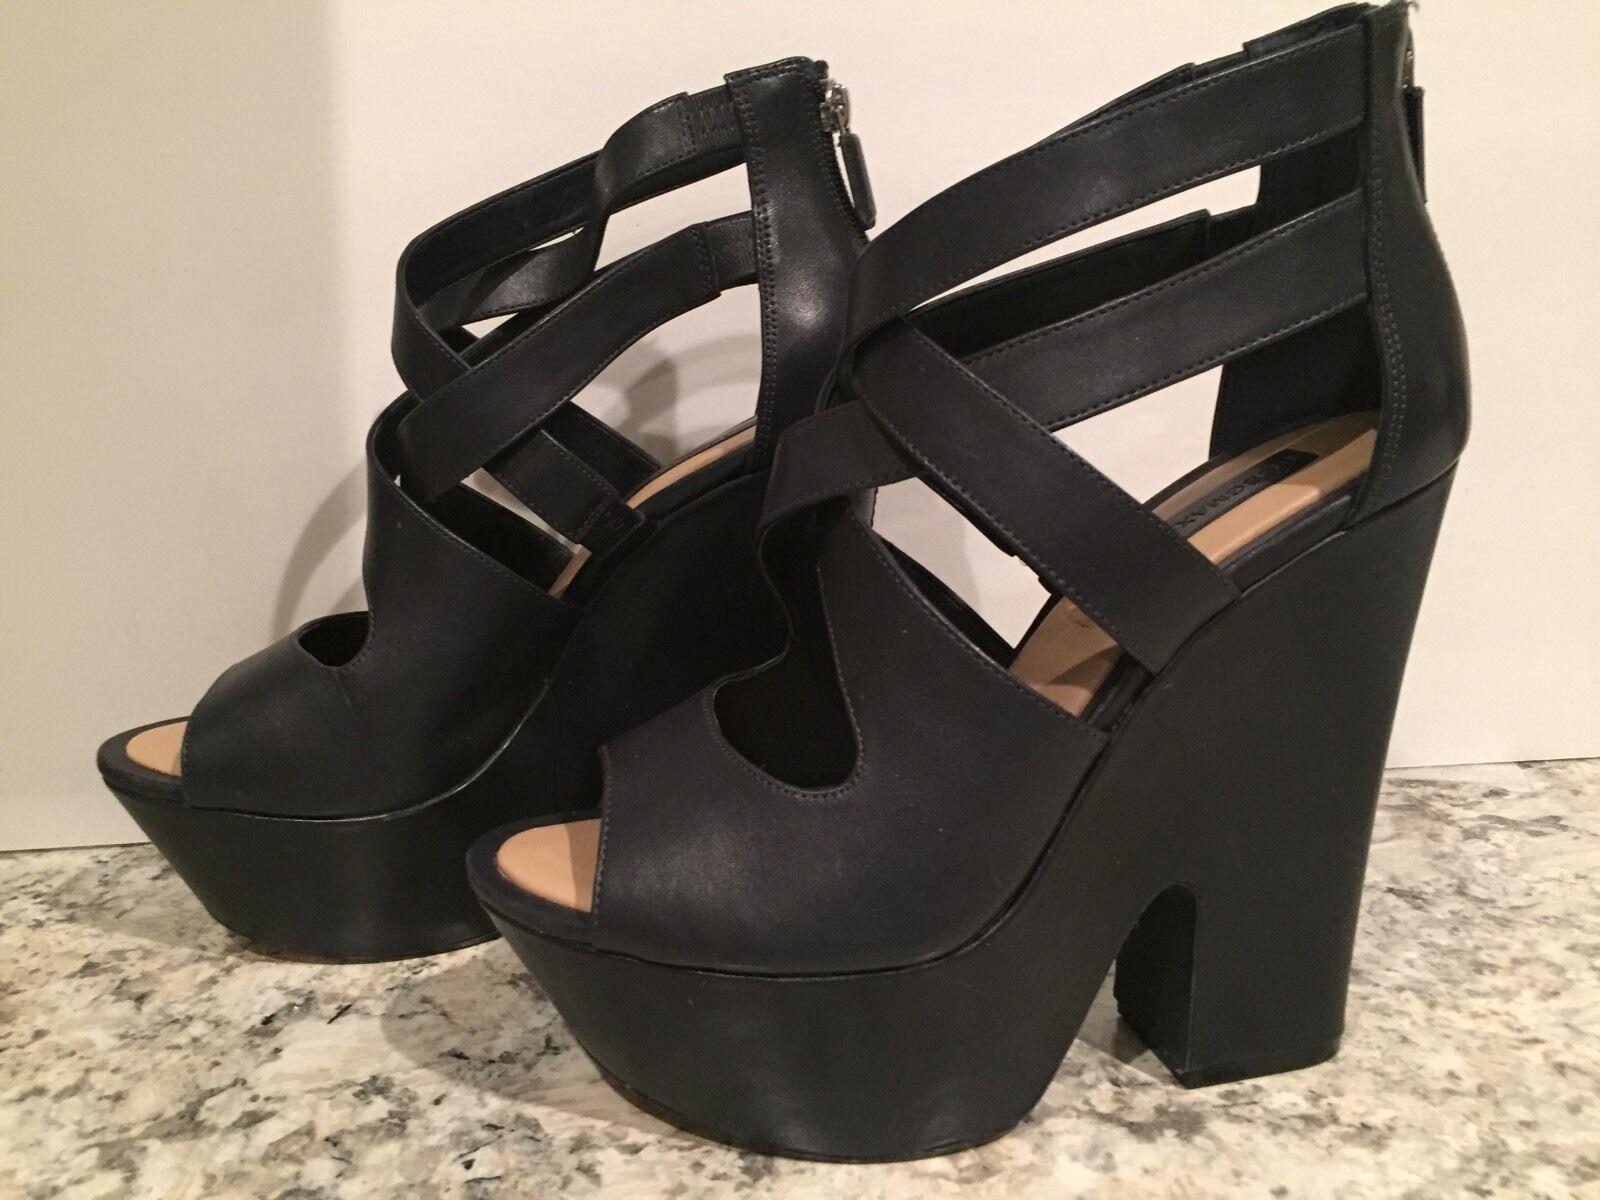 BCBG Max Azria Zoey Sandals Platform Leather Open Open Open Toe Dark grau 10 B 300 & Up a1e79f